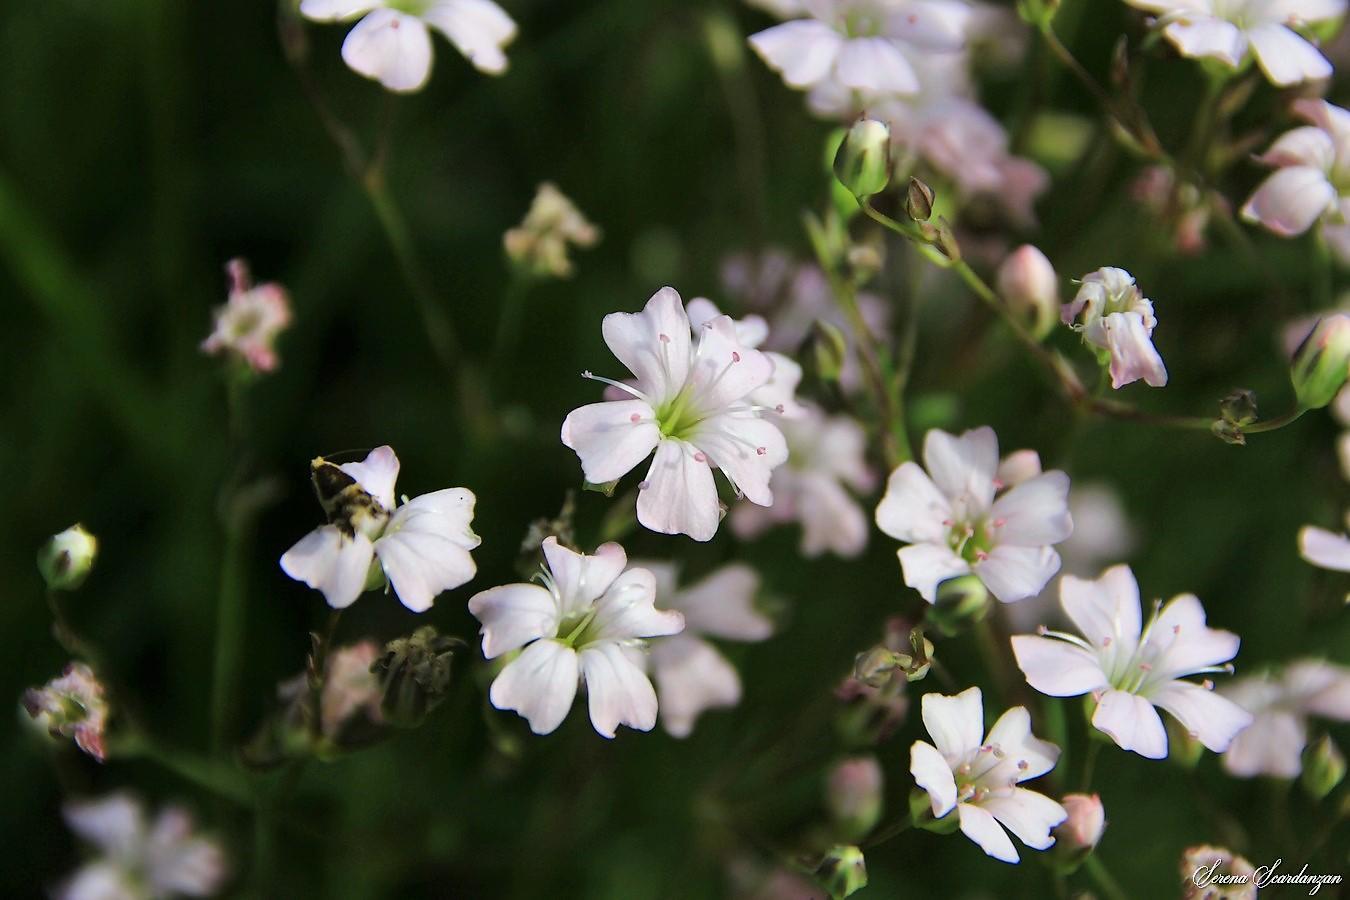 Gipsofila strisciante (Gypsophila repens) di Serena Scardanzan